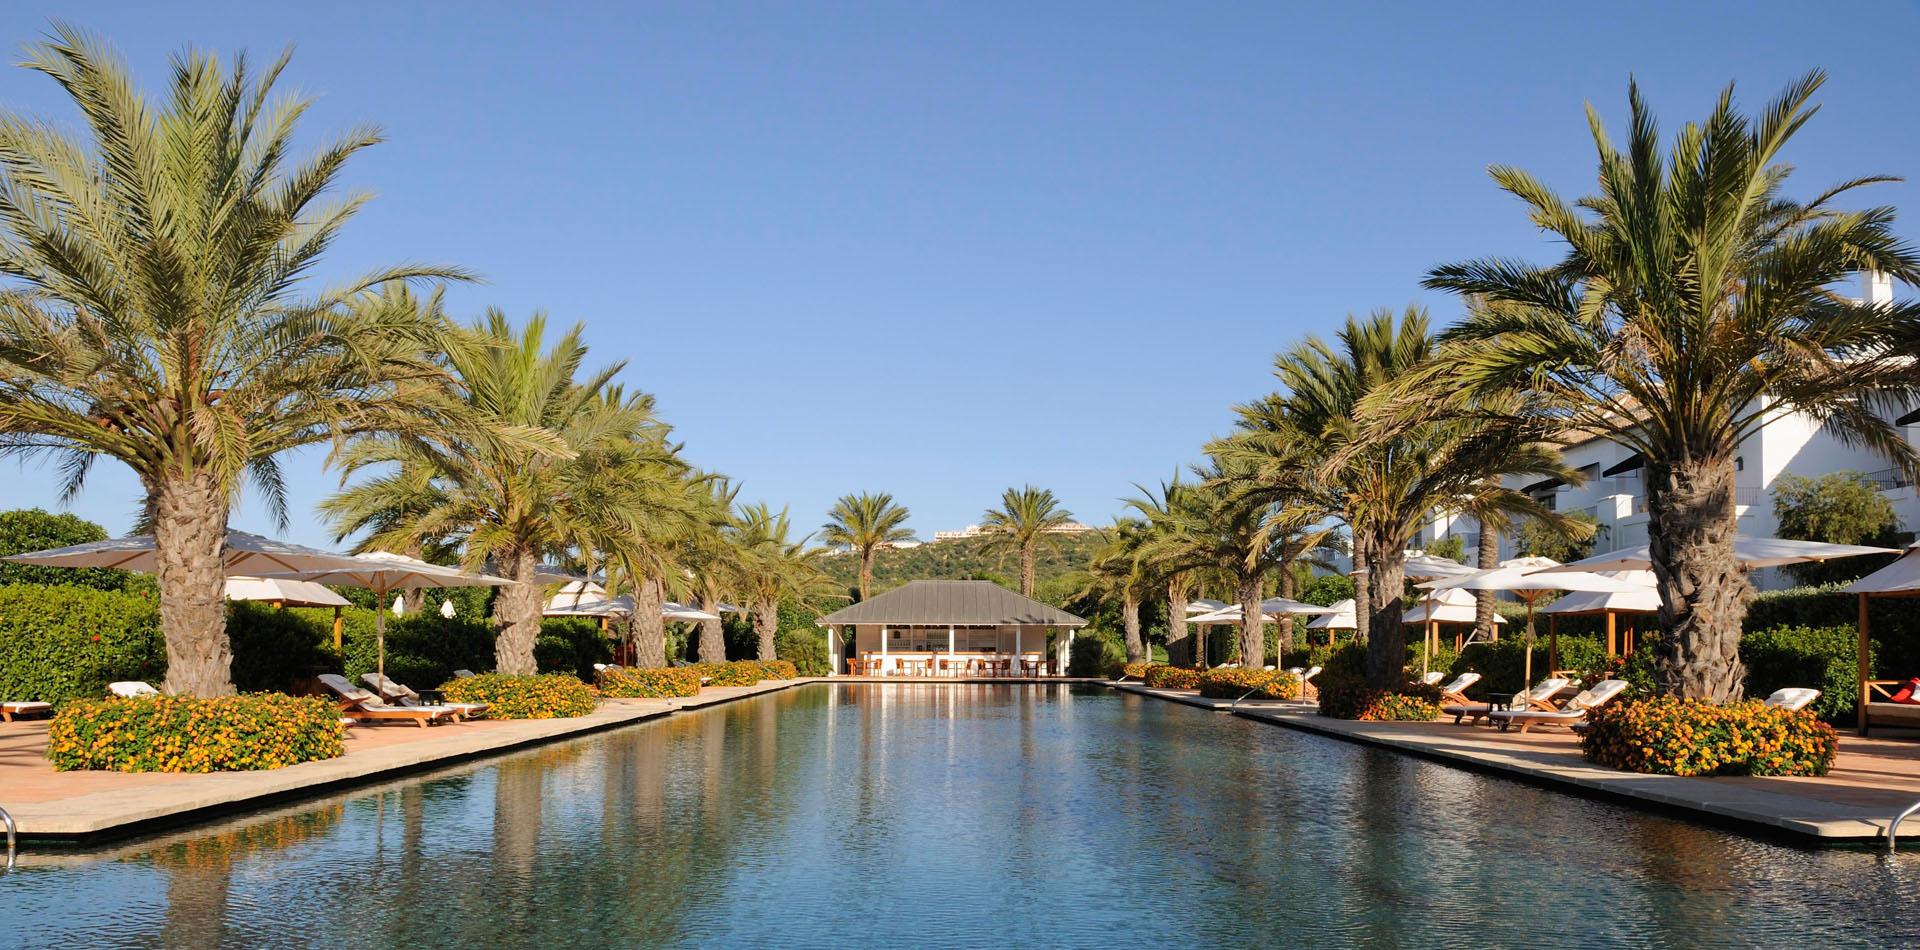 Luxushotel in Spanien Finca Cortesin Hotel Golf & Spa